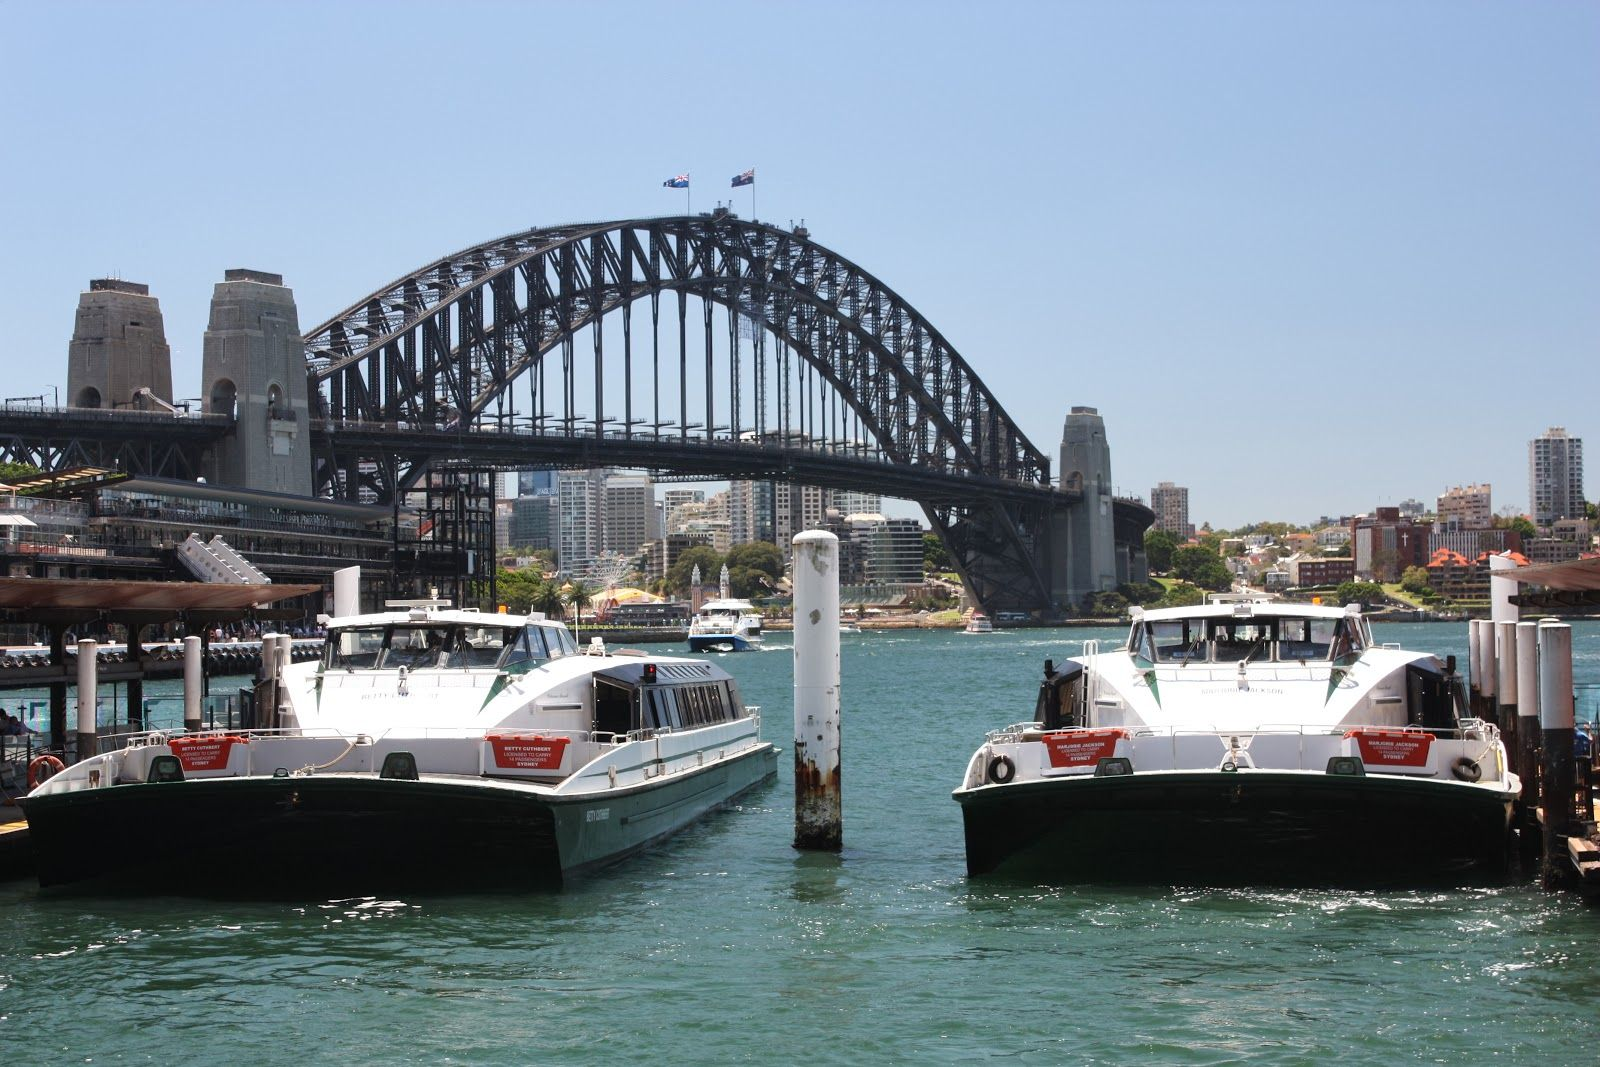 Sydney -  Circular Quay, Rivercat class ferries